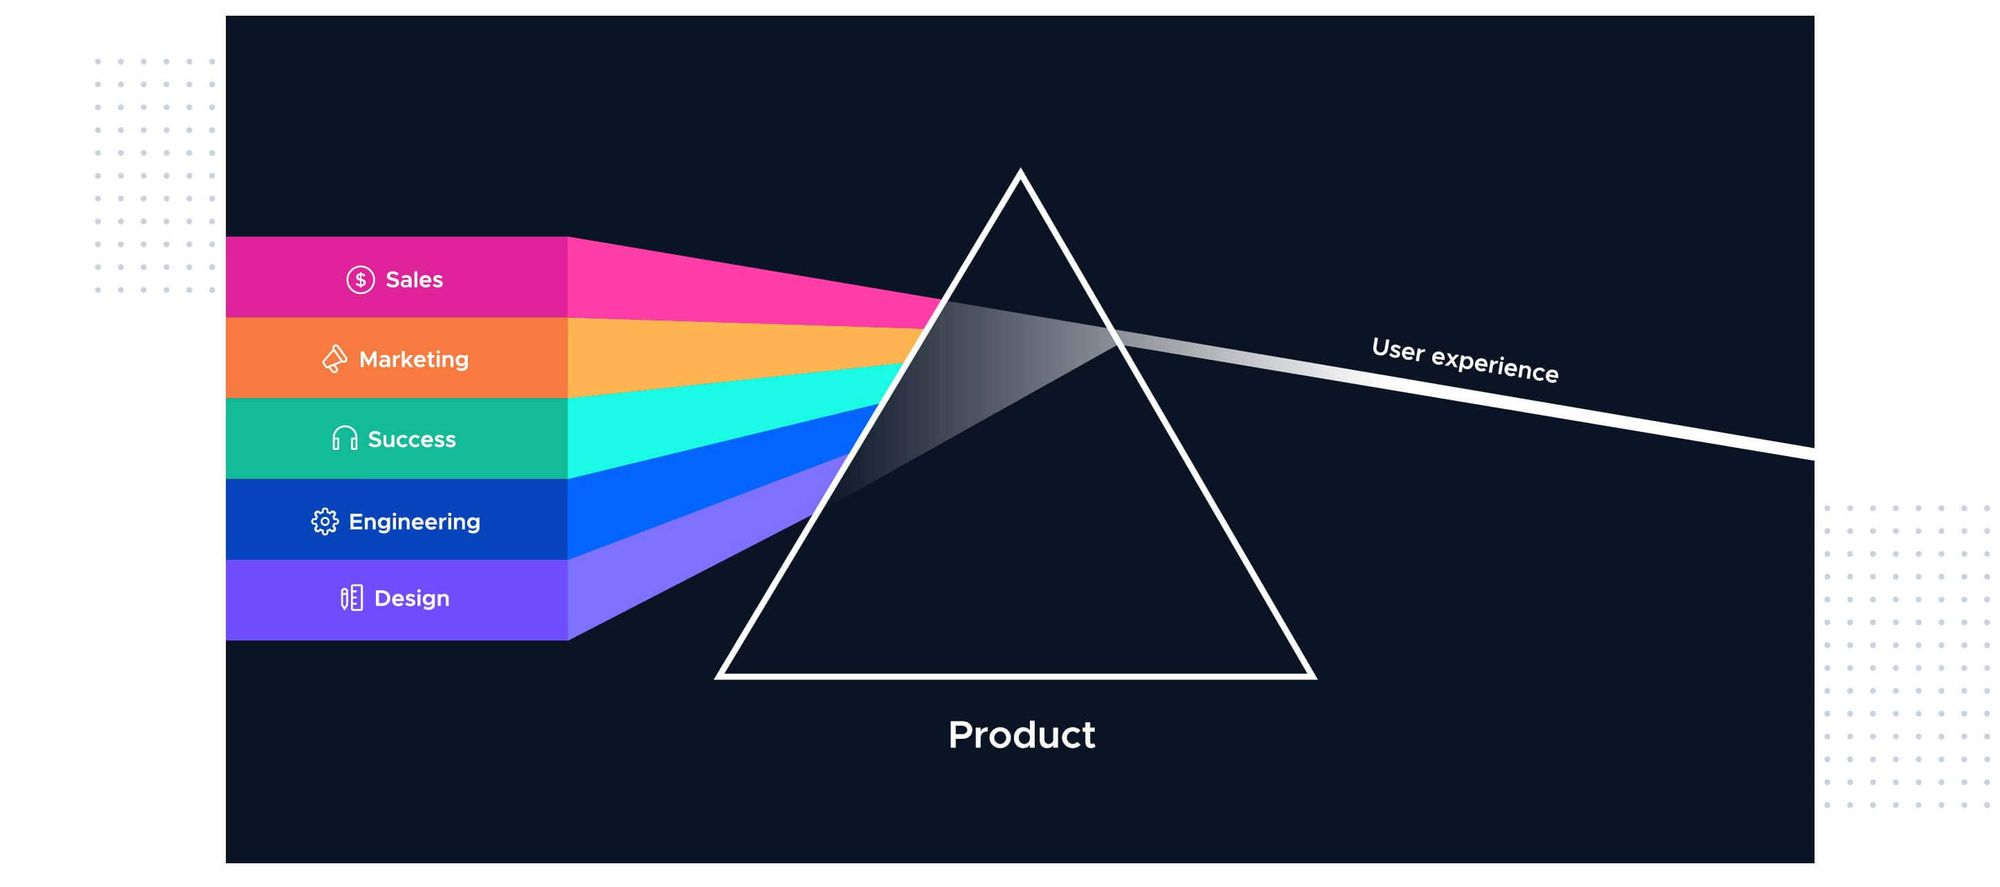 User-experience-pyramid